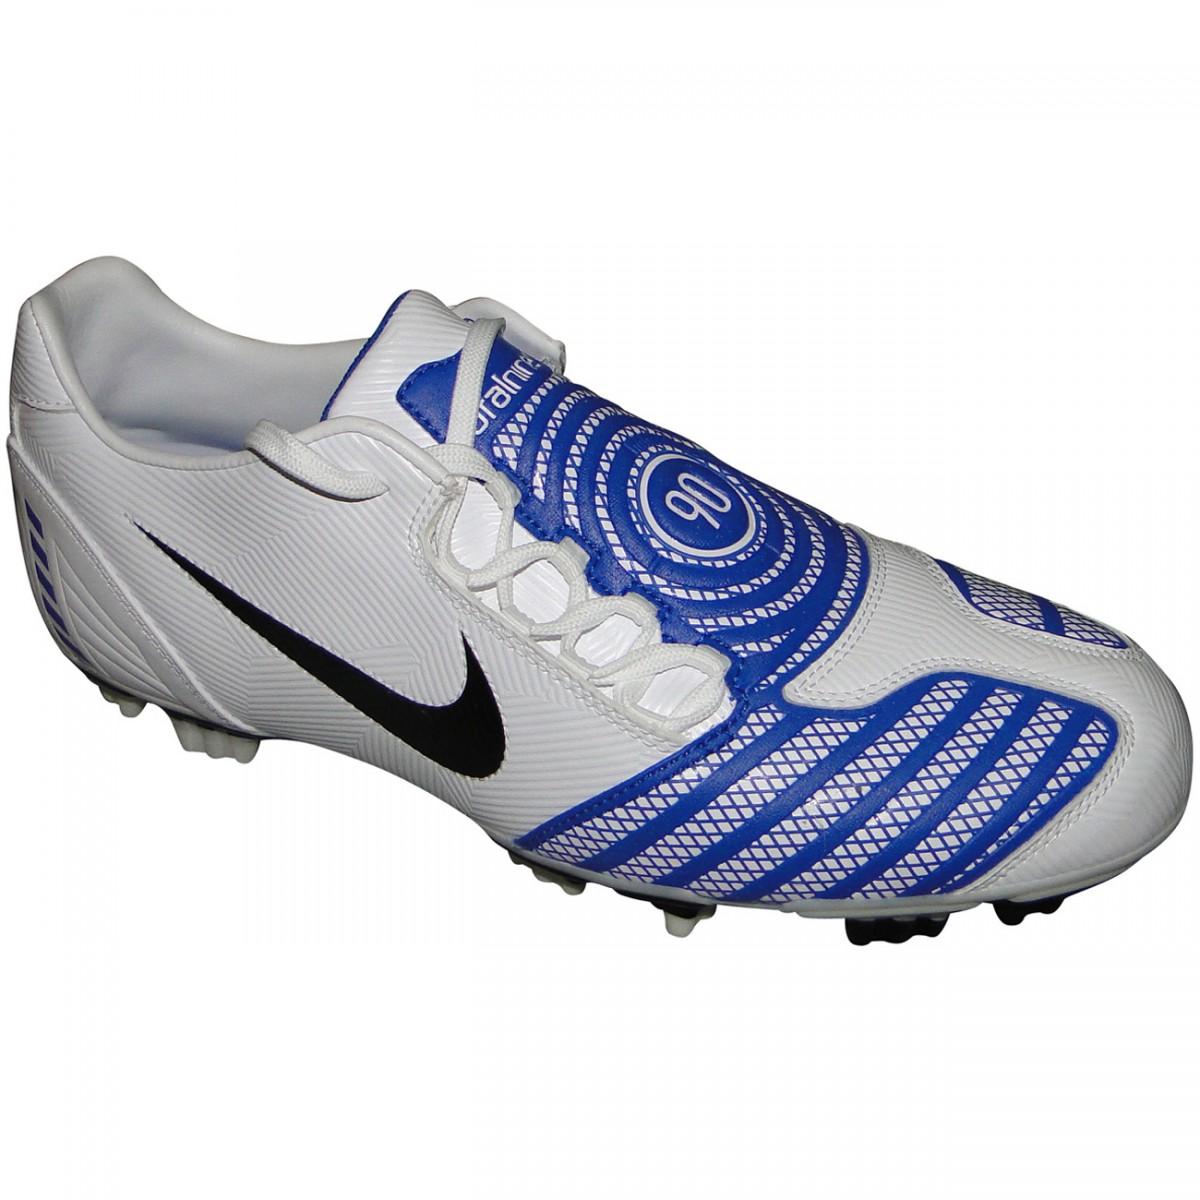 b9a71bab6fd96 Chuteira Nike T90 Shoot 6034 - BRANCO/AZUL - Chuteira Nike, Adidas.  Sandalias Femininas. Sandy Calçados